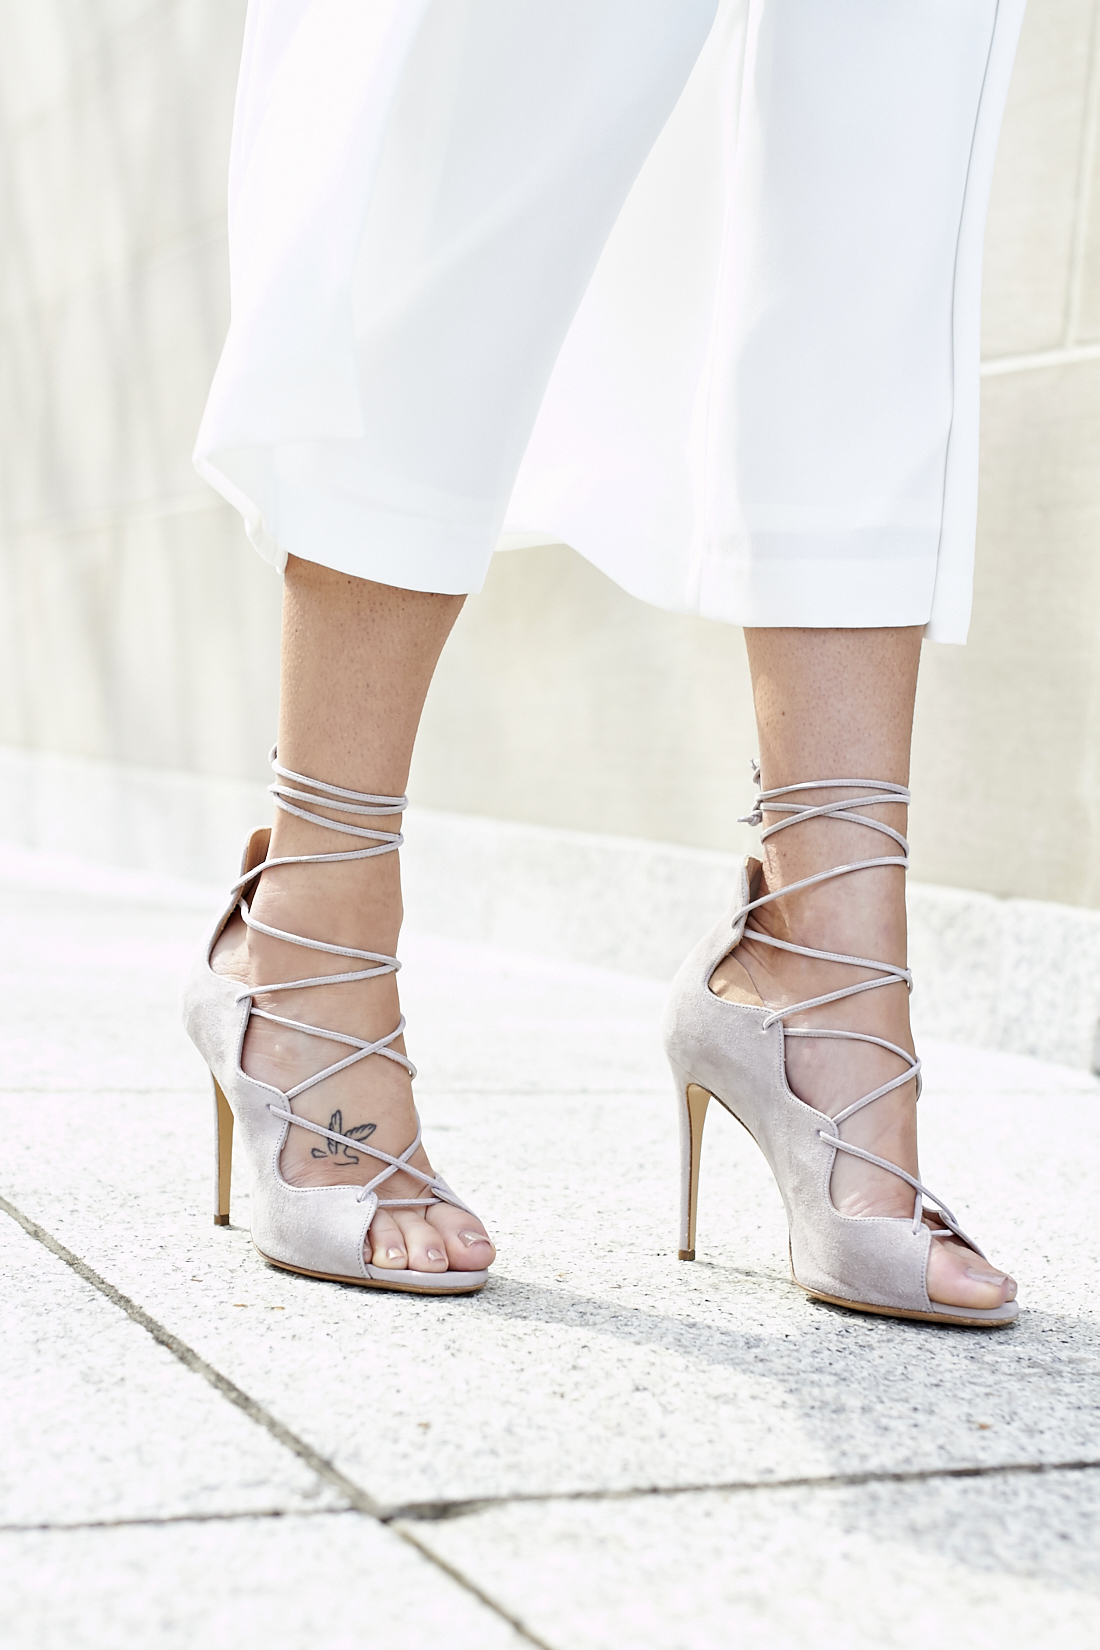 fashion-jackson-mgemi-marea-lace-up-heels-white-culottes